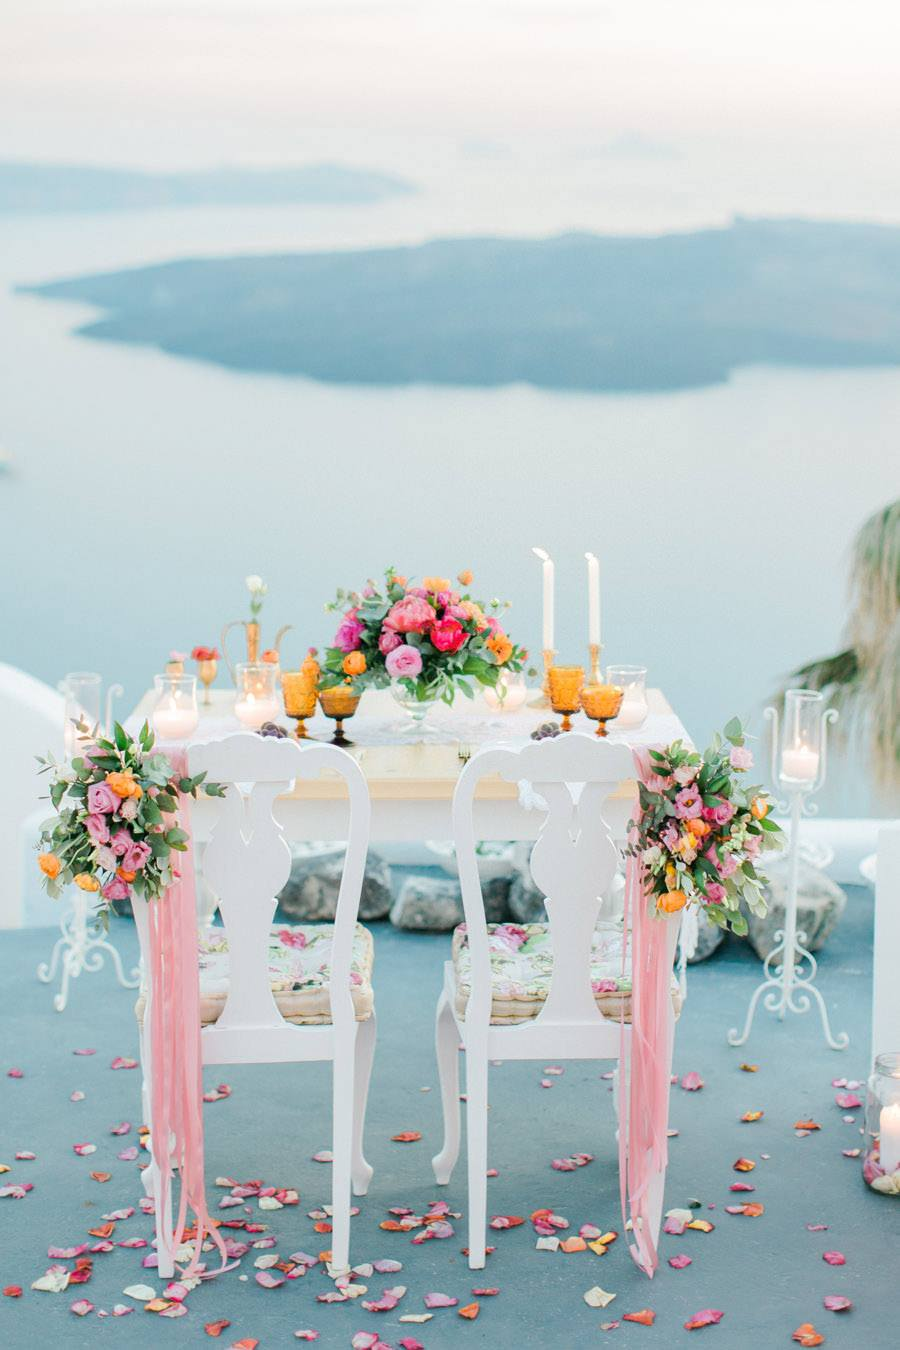 BODA ÍNTIMA EN SANTORINI decoracion-boda-santorini